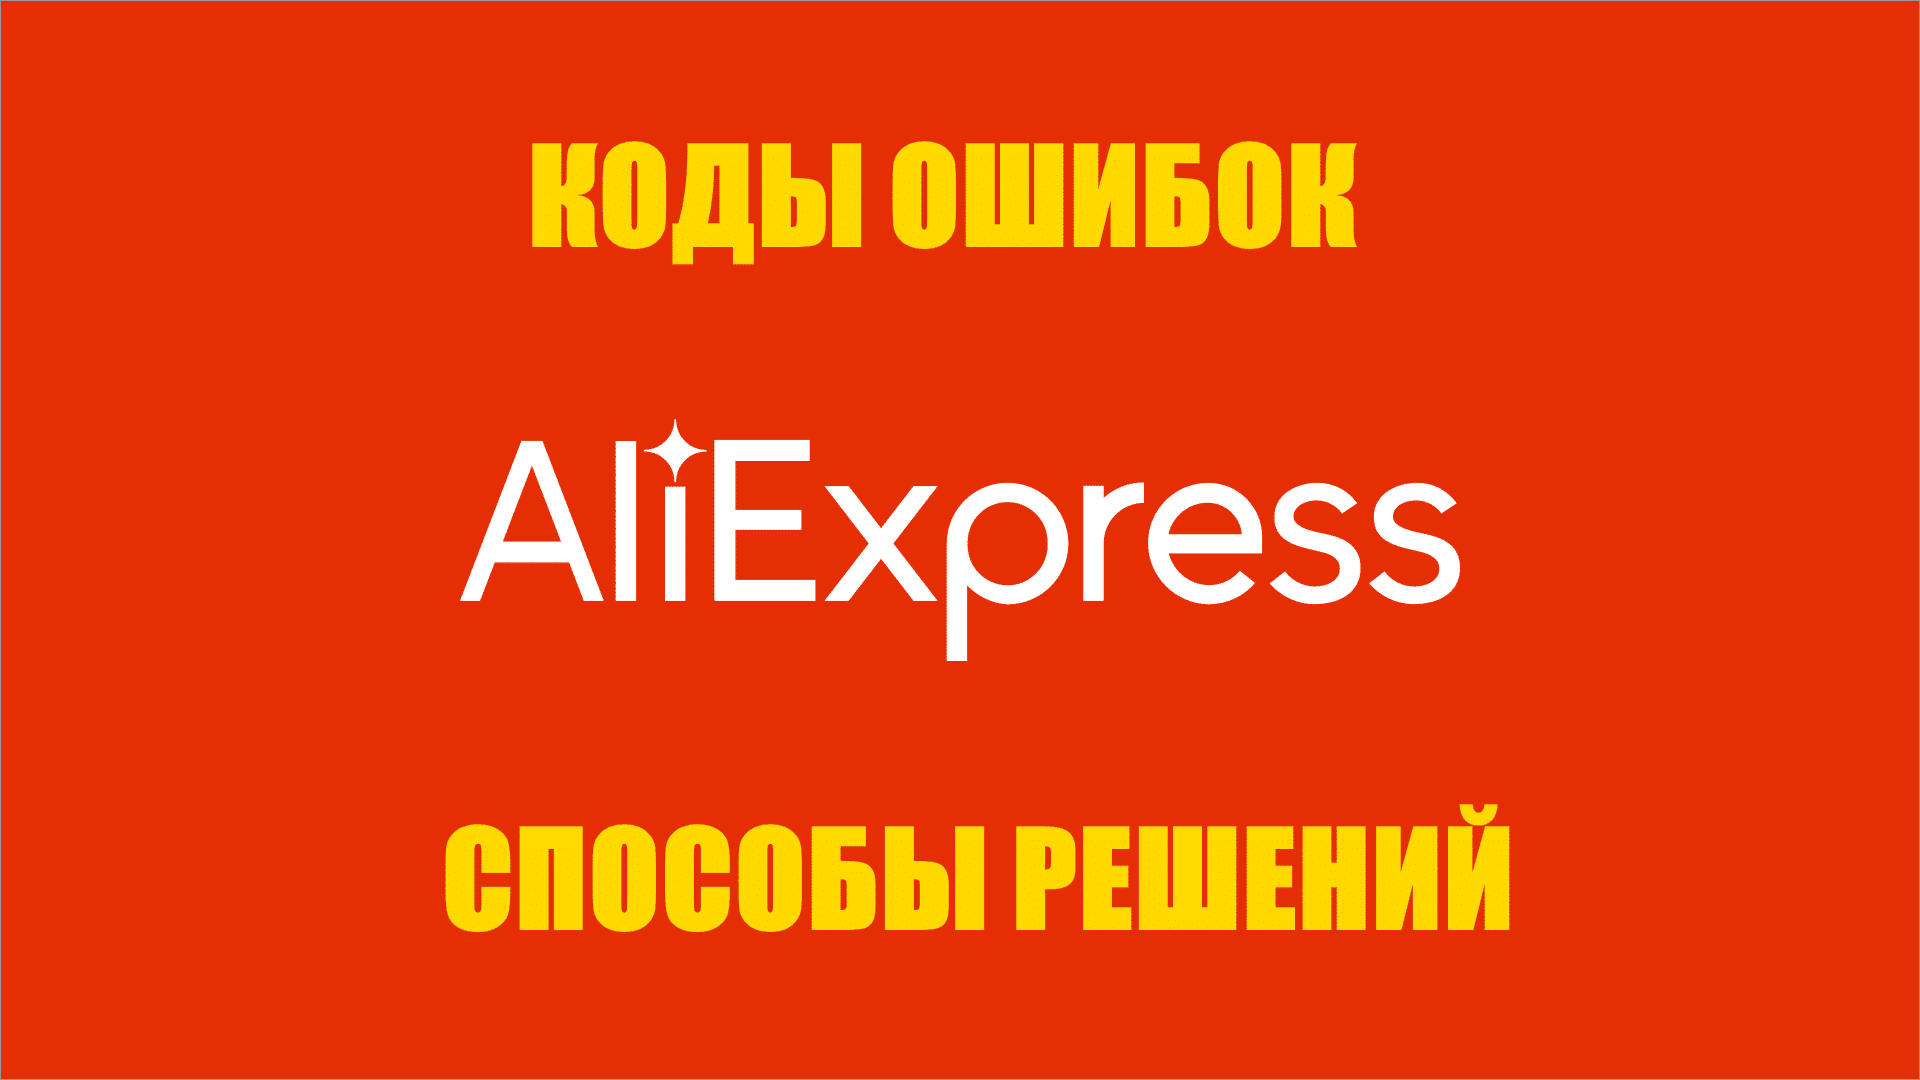 codes-errors-aliexpress